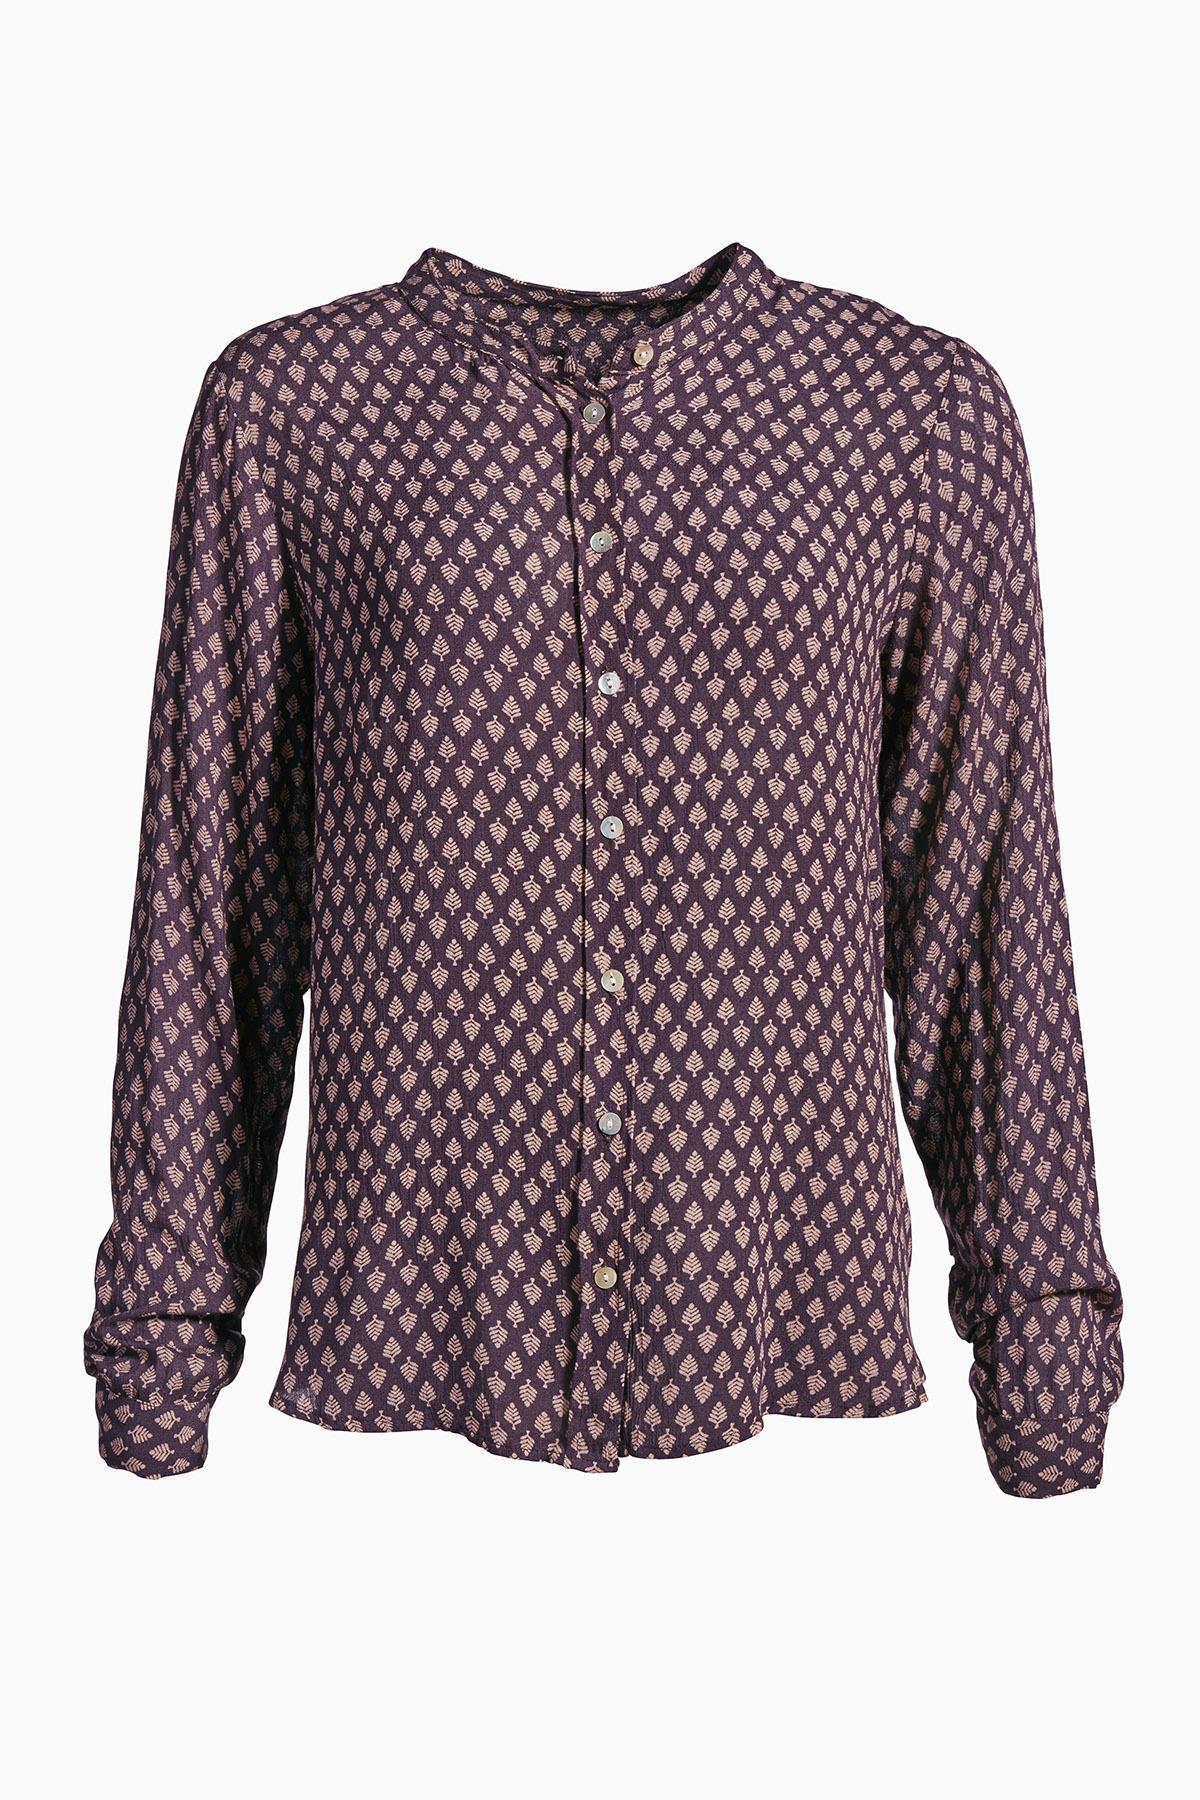 Plum Perfect Langarm - Hemd von Kaffe – Shoppen Sie Plum Perfect Langarm - Hemd ab Gr. 34-46 hier